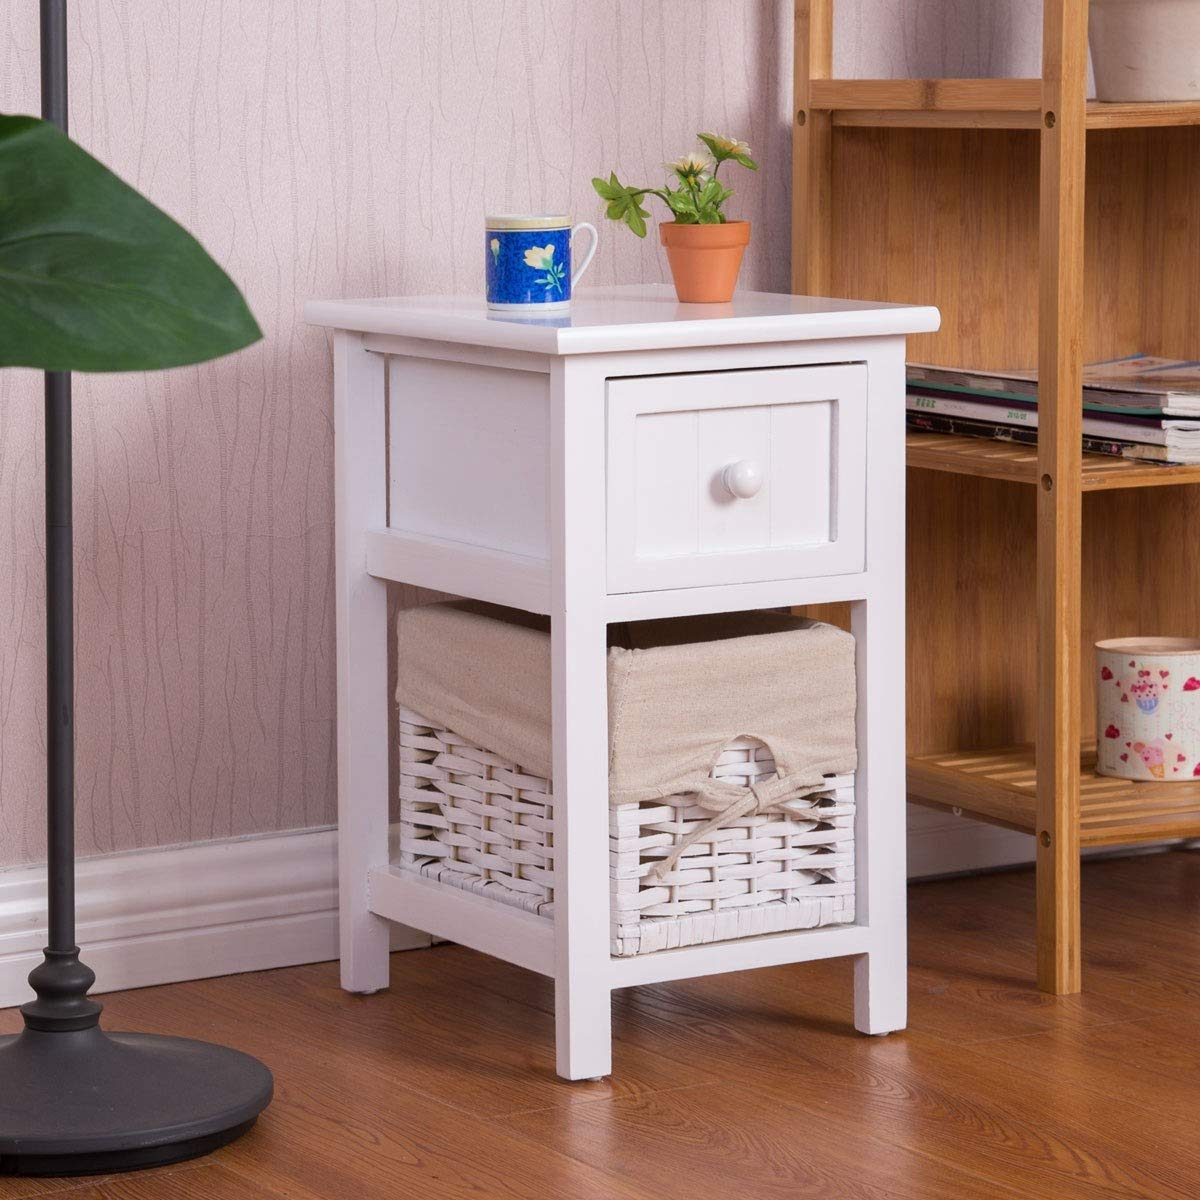 2 Tier 1 Drawer Bedside Organizer Wood Nightstand w/ Basket